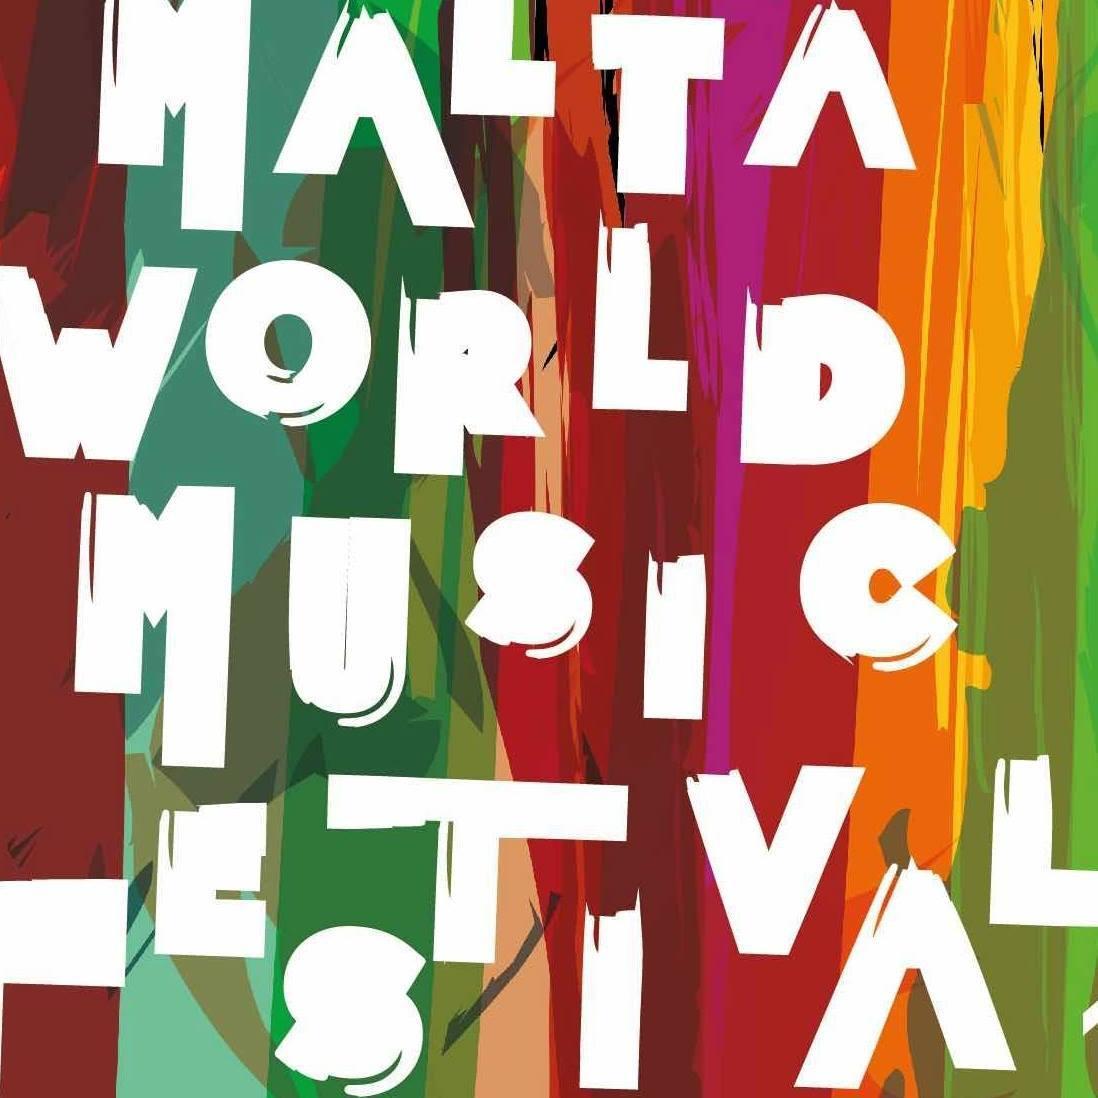 Malta Festivals 2019